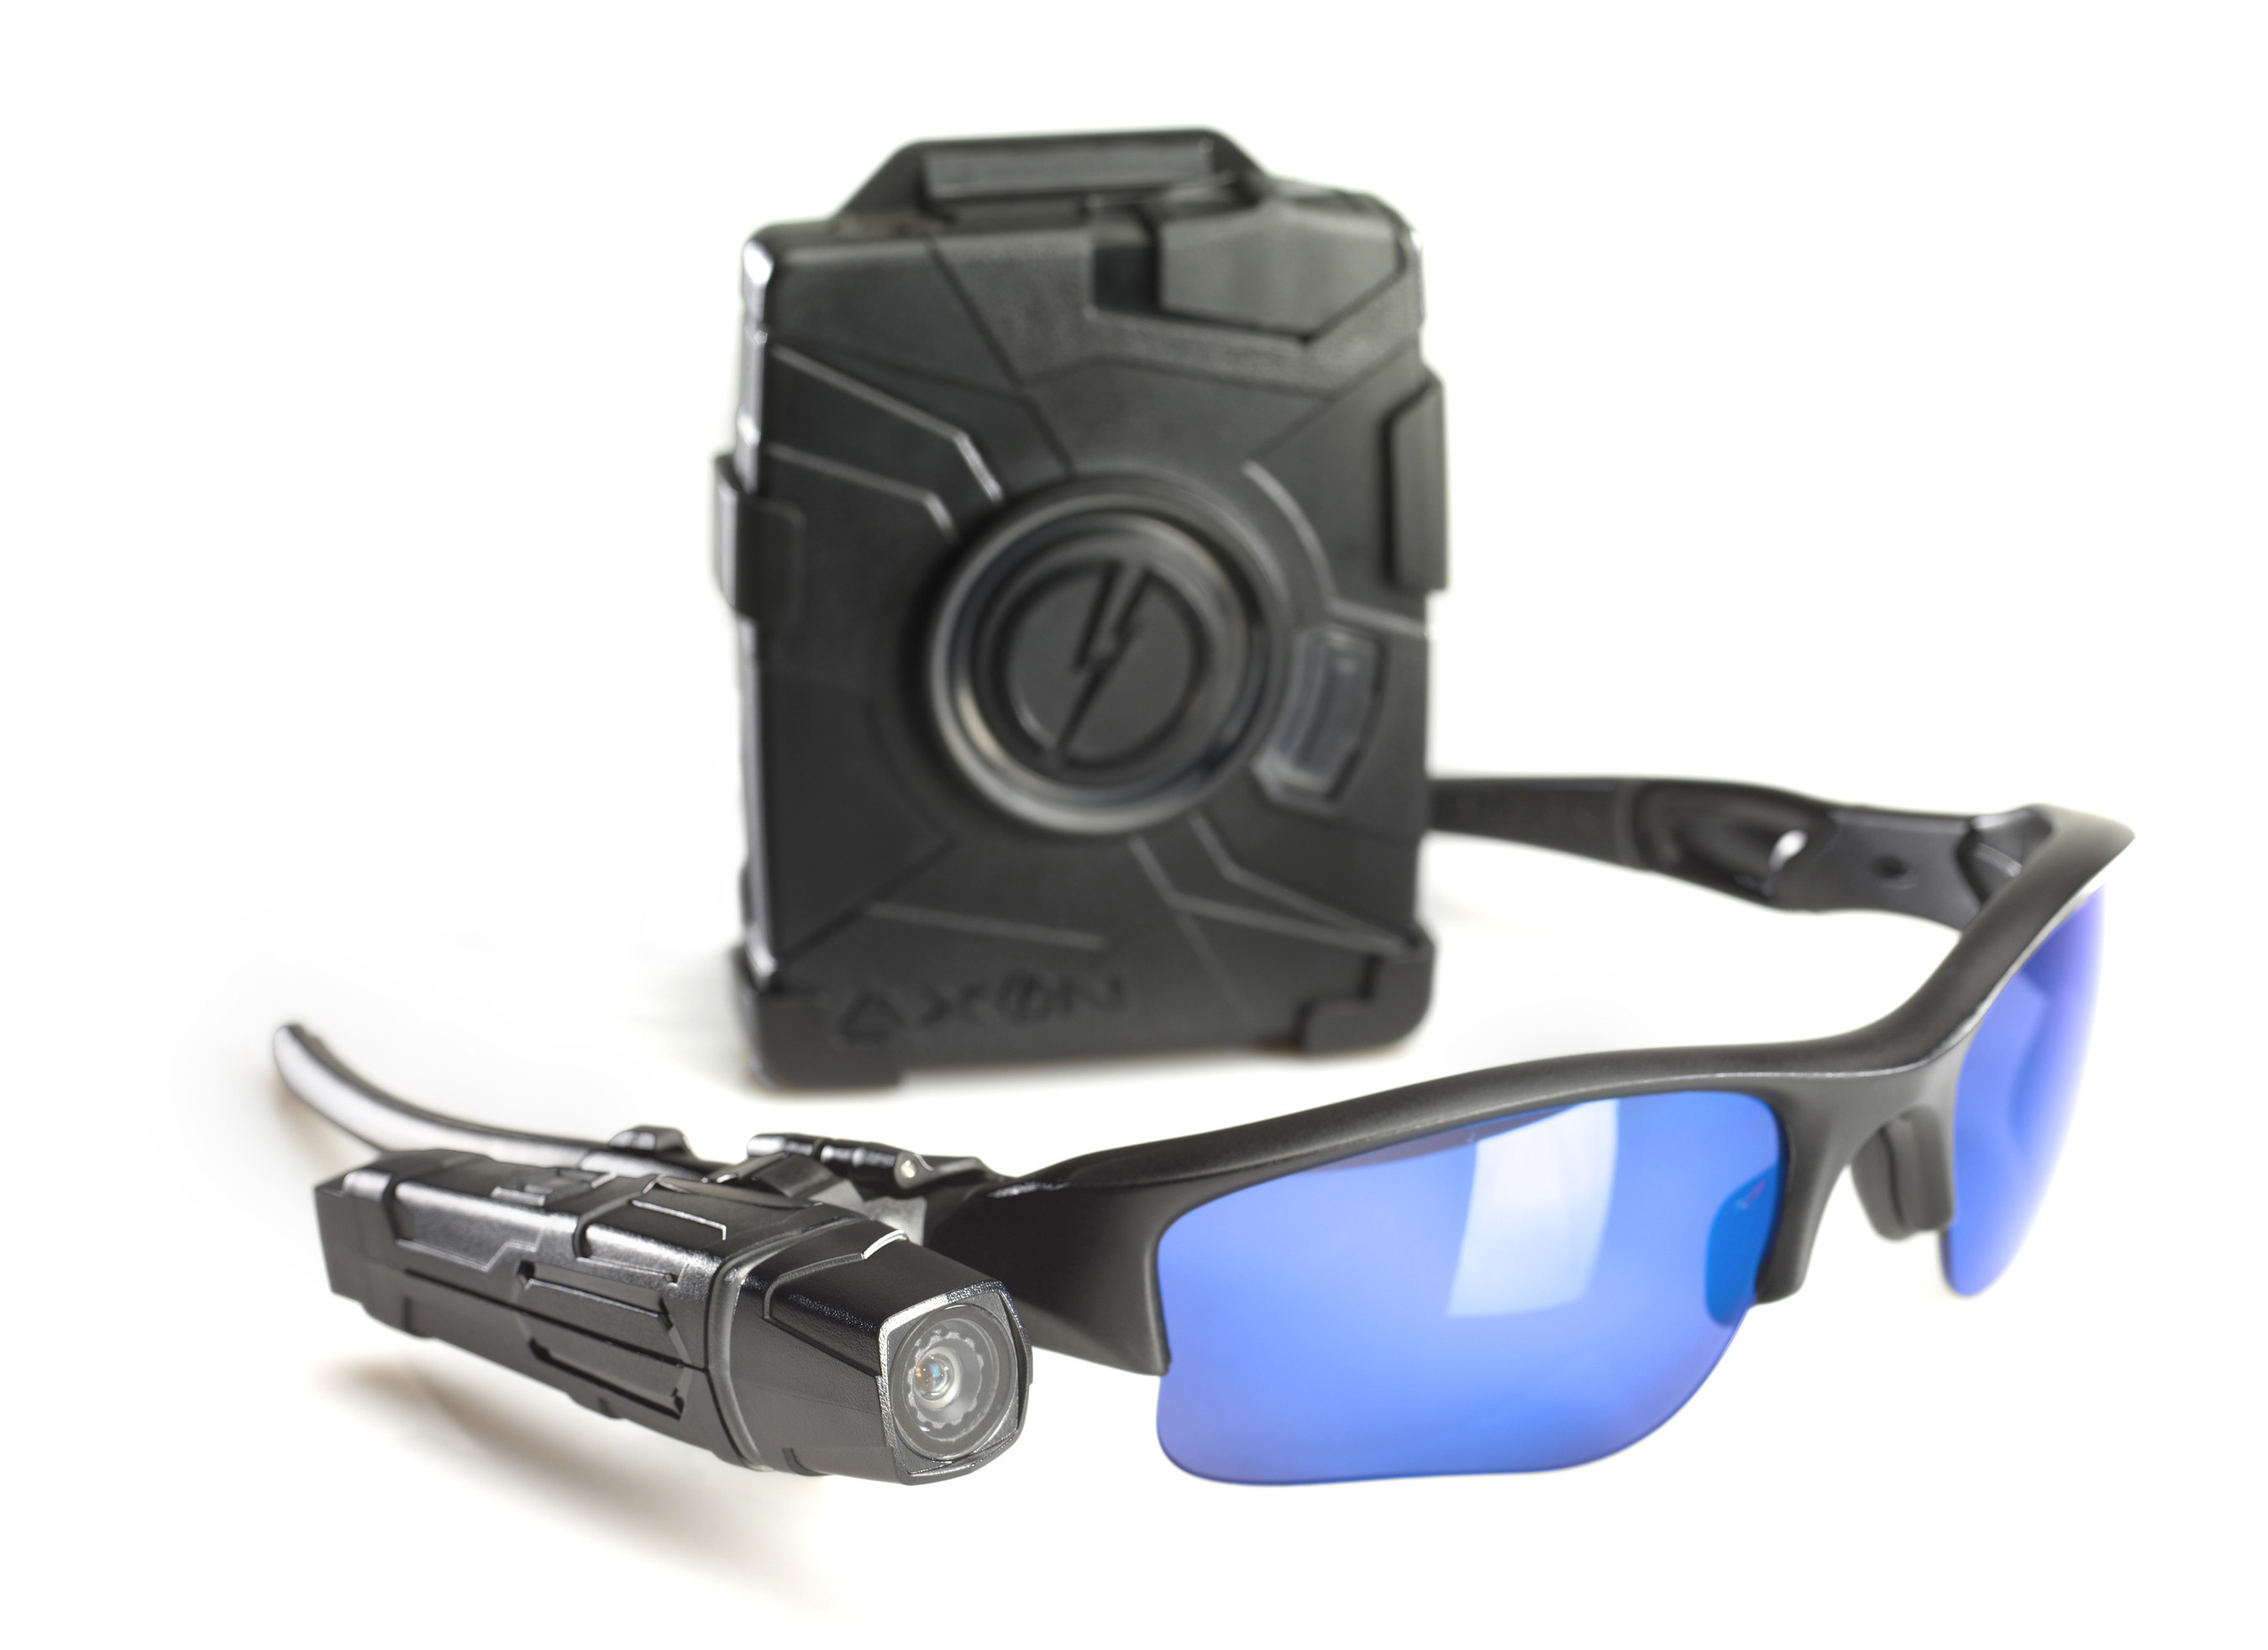 TASER'S AXON flex and body Cameras